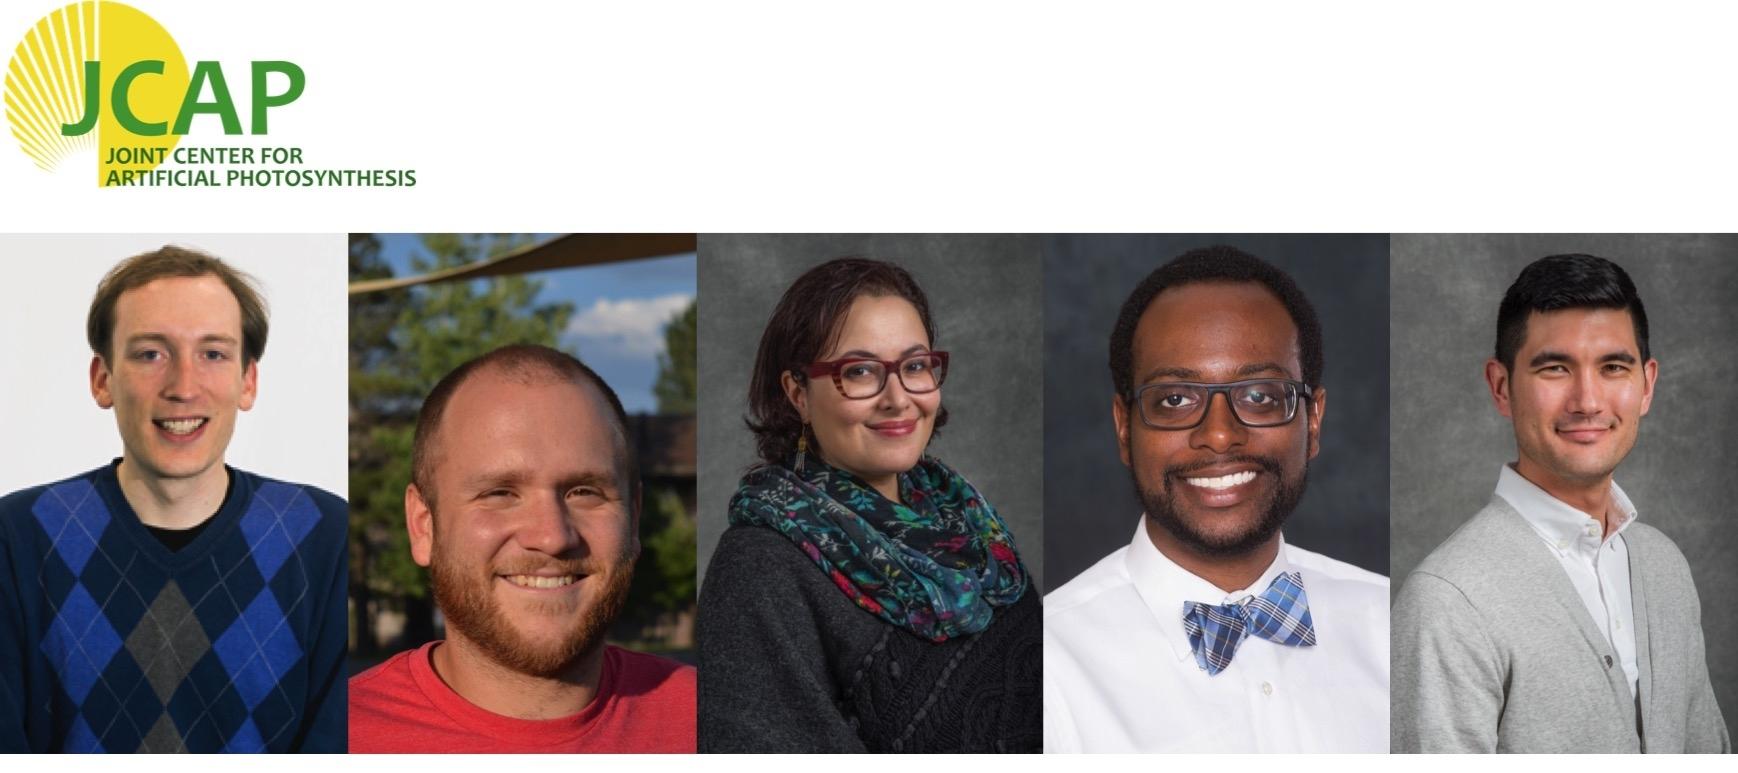 JCAP Team Science winners: Zachary W. Ulissi, Daniel A. Torelli, Maryam Farmand, Jeremy T. Feaster, and Sean W. Fackler